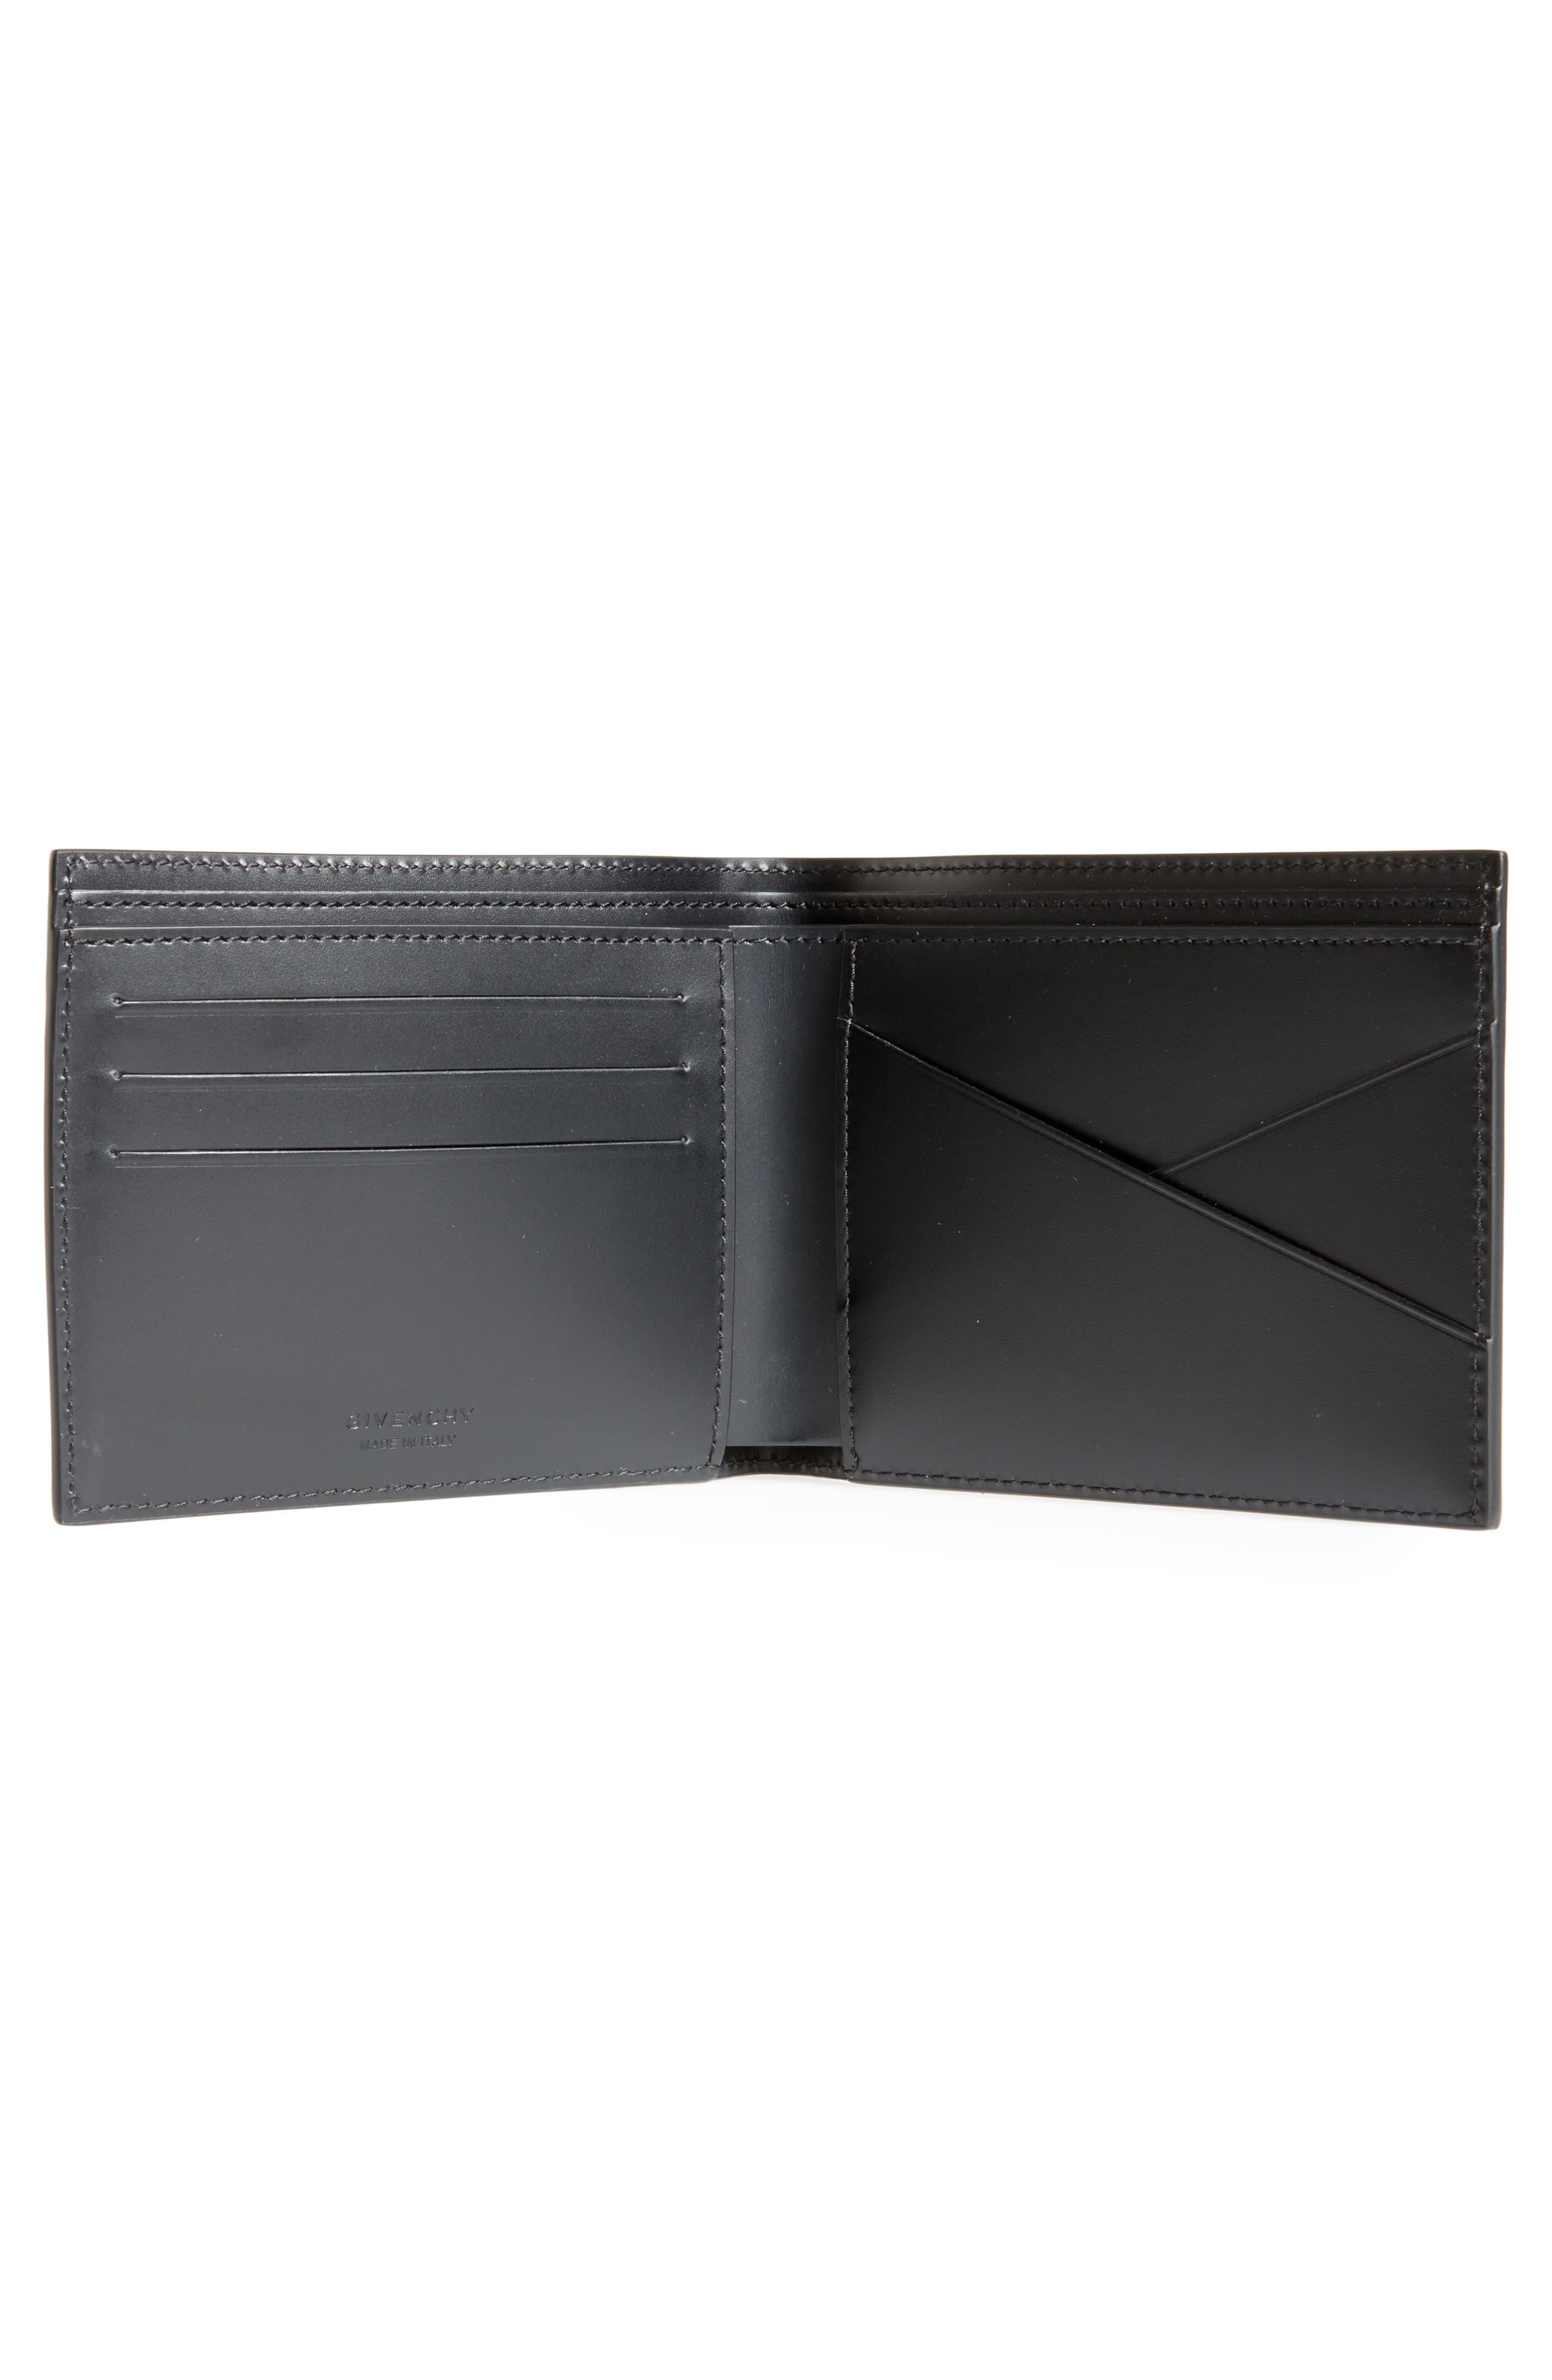 Alternate Image 3  - Givenchy Iris Logo Print Calfskin Leather Wallet